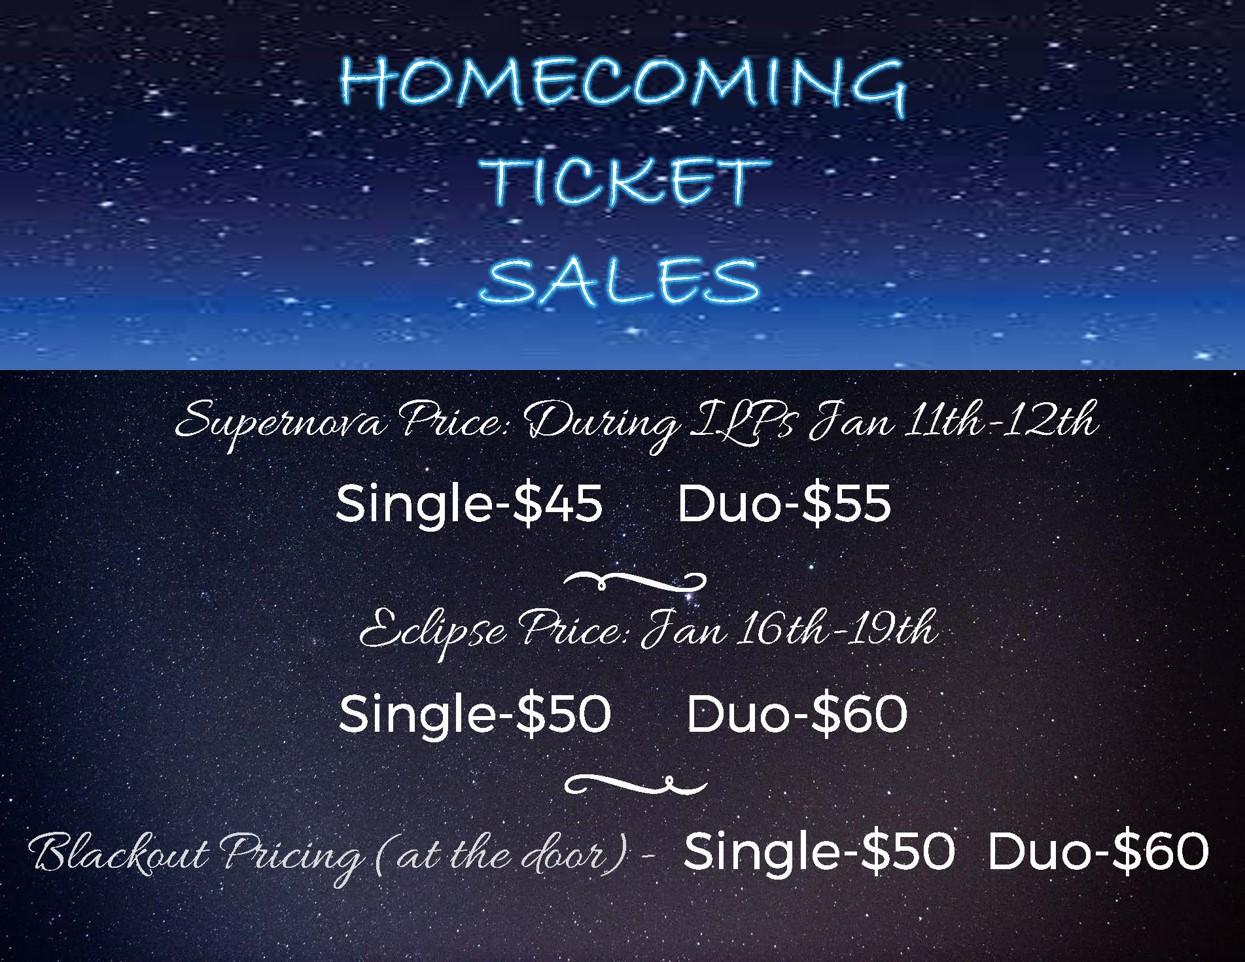 hs-eblast-ilp-homecoming-ticket-sales.jpg